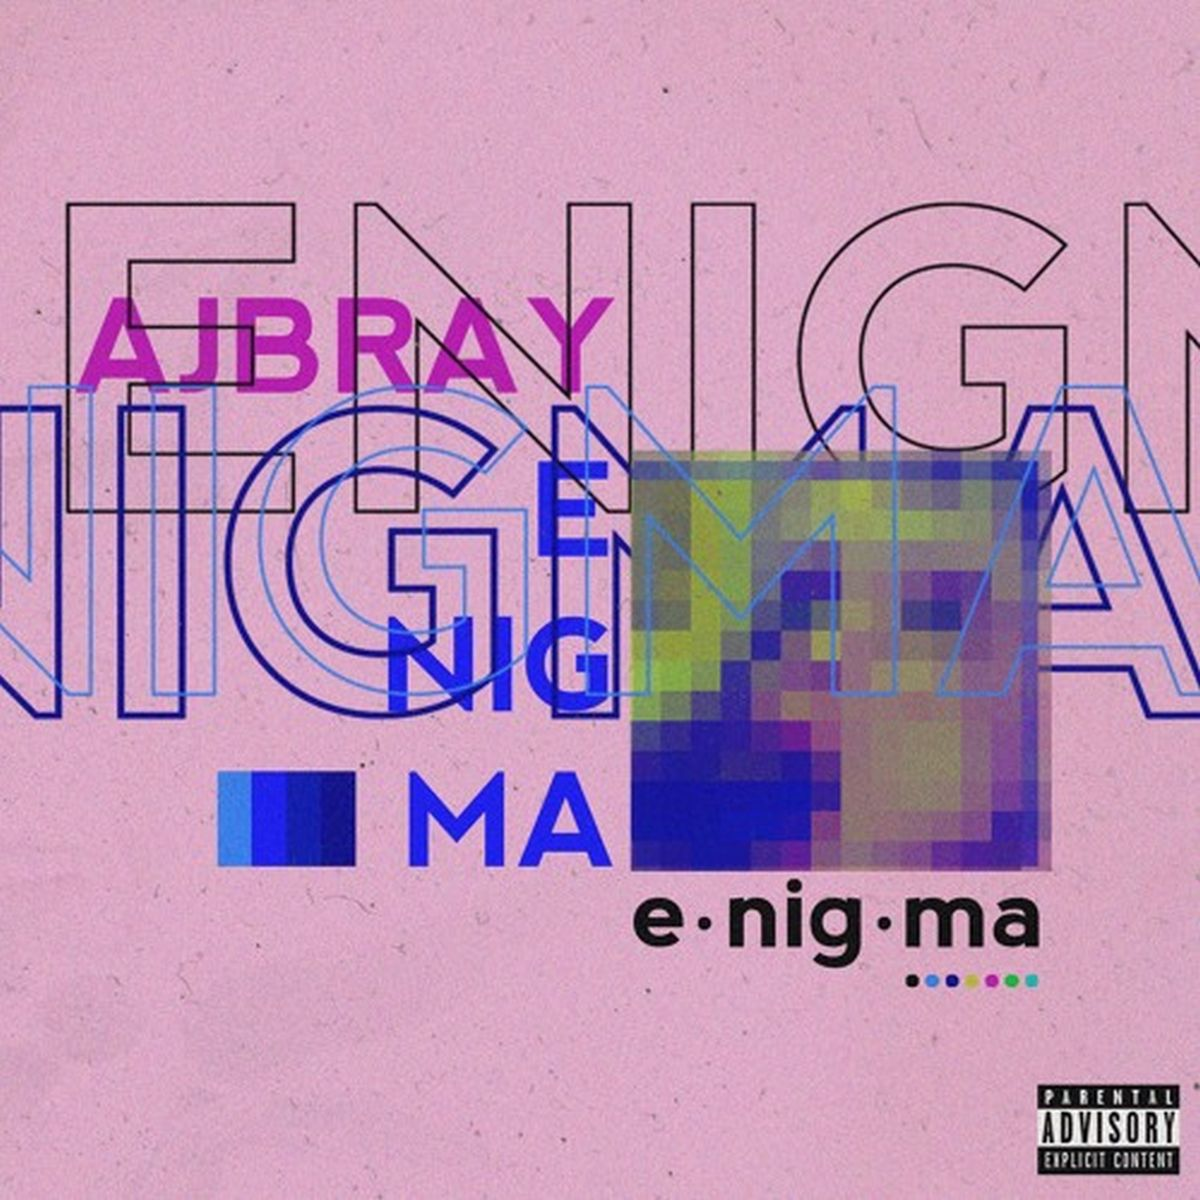 AJ Bray – Enigma